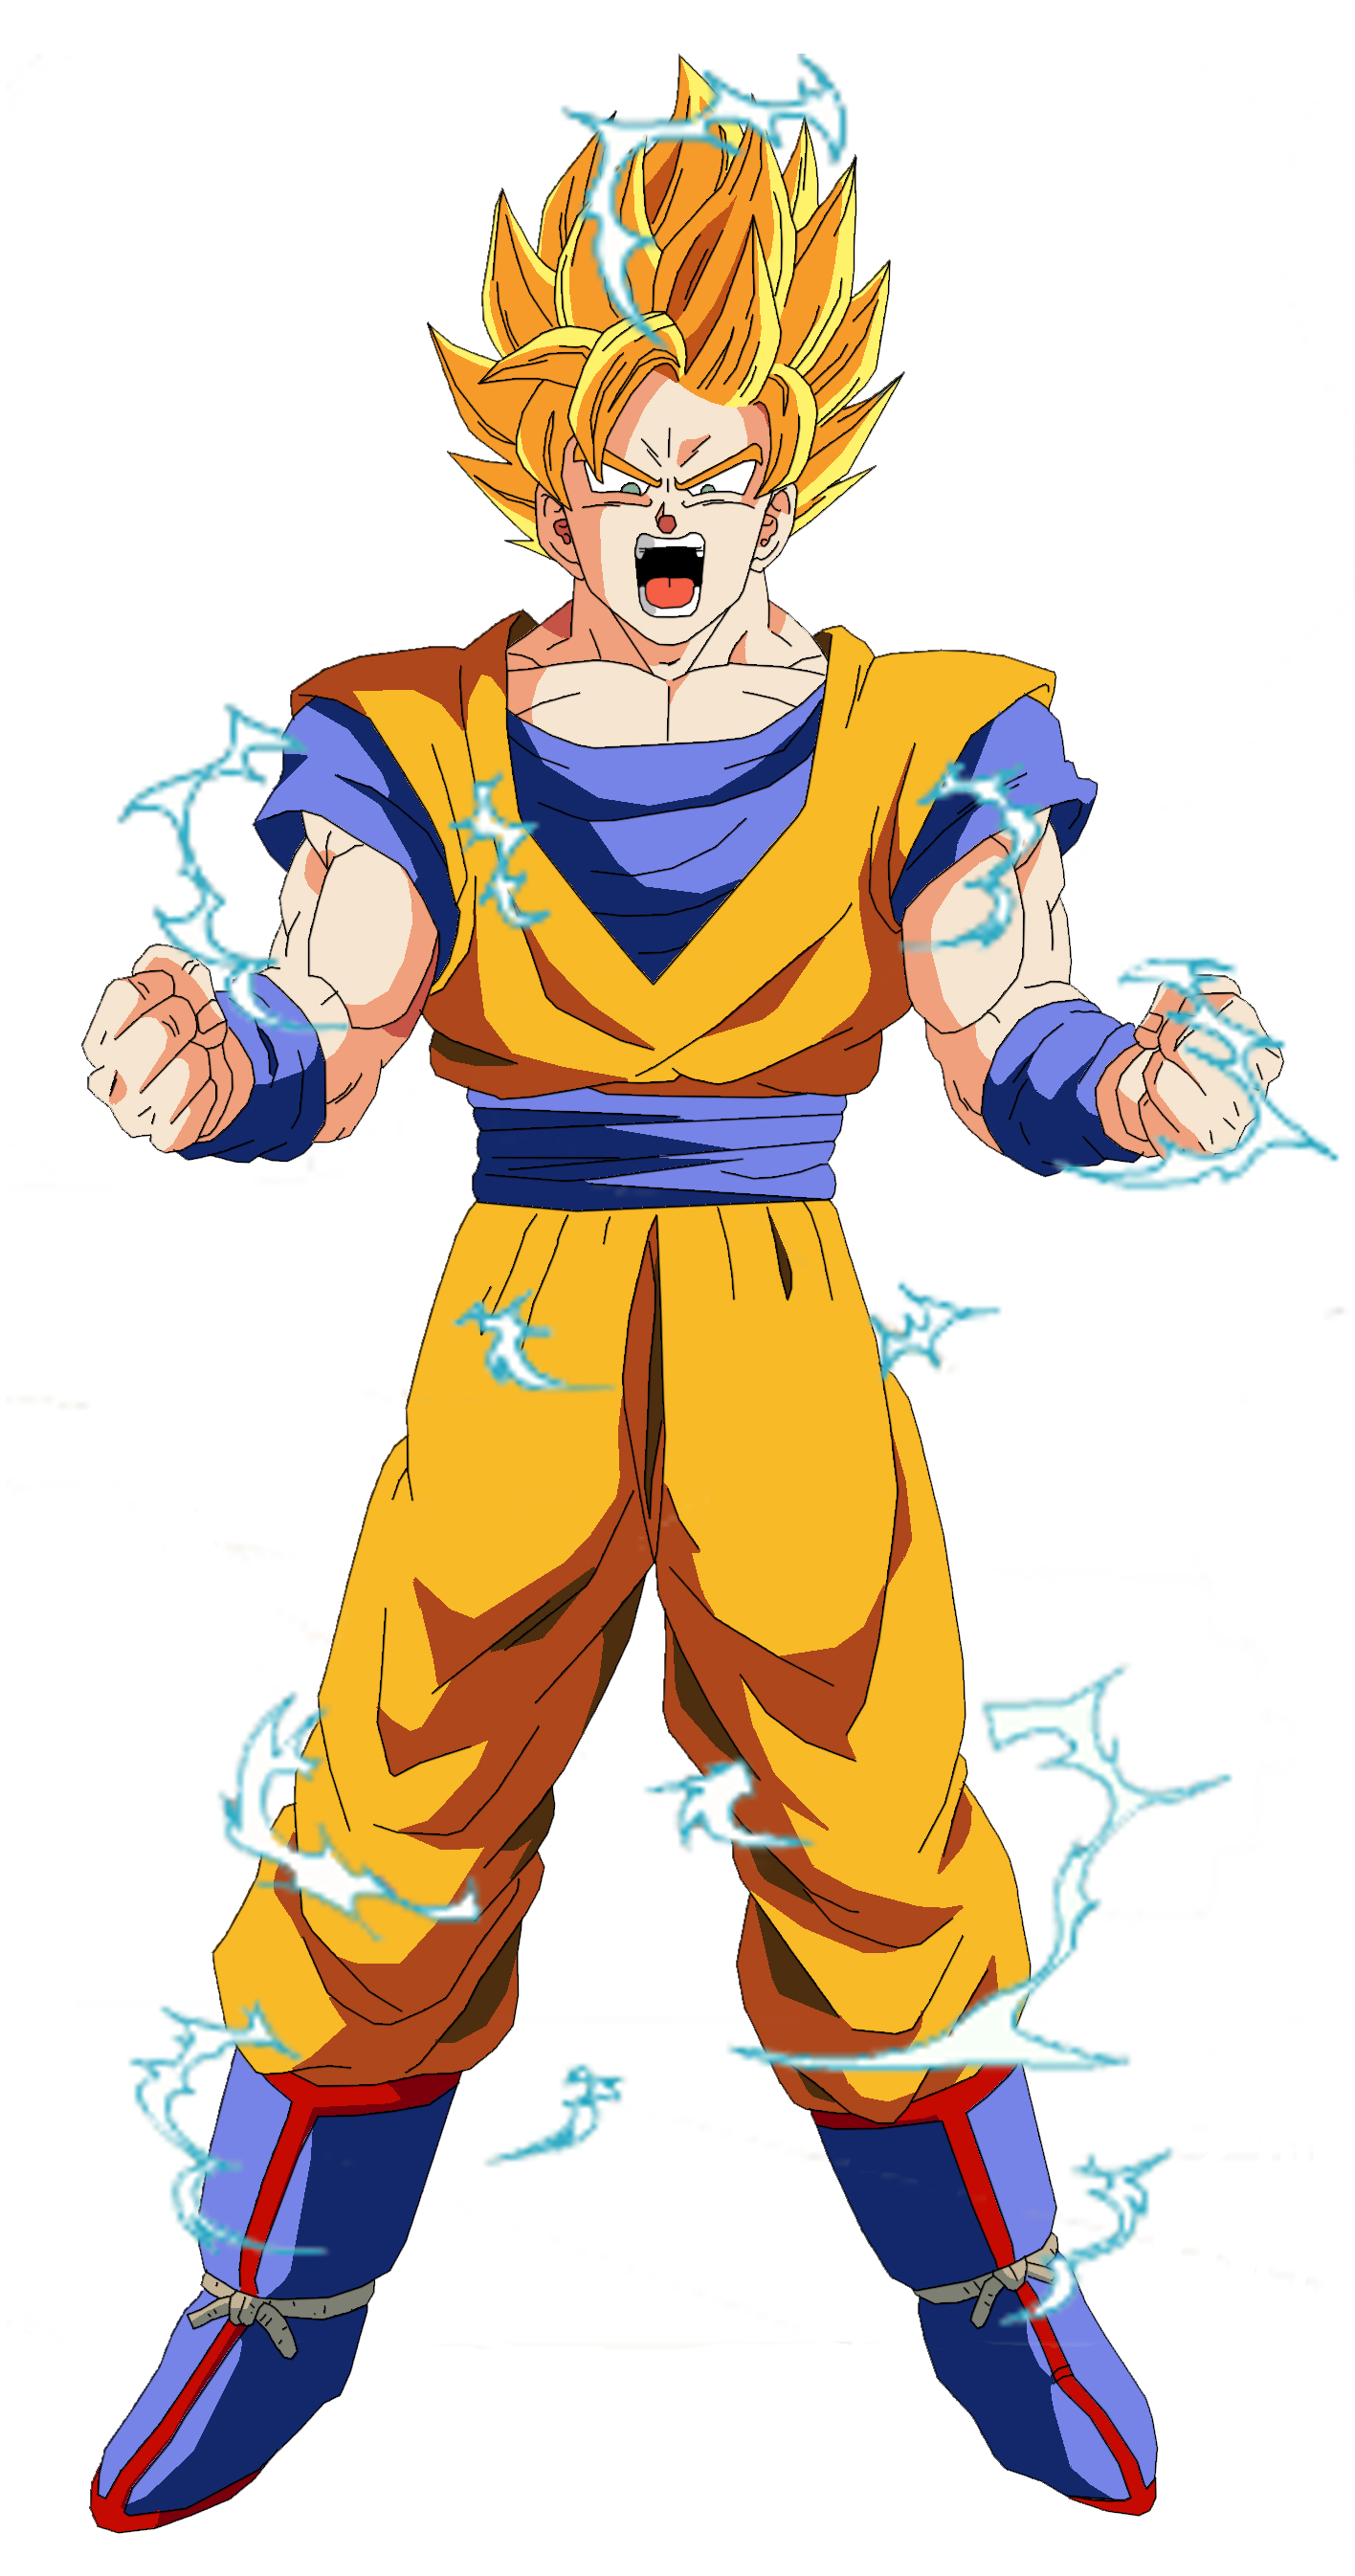 Gok SSJ2  Dragon Ball Z  Pinterest  Dragon ball Dragons and Goku